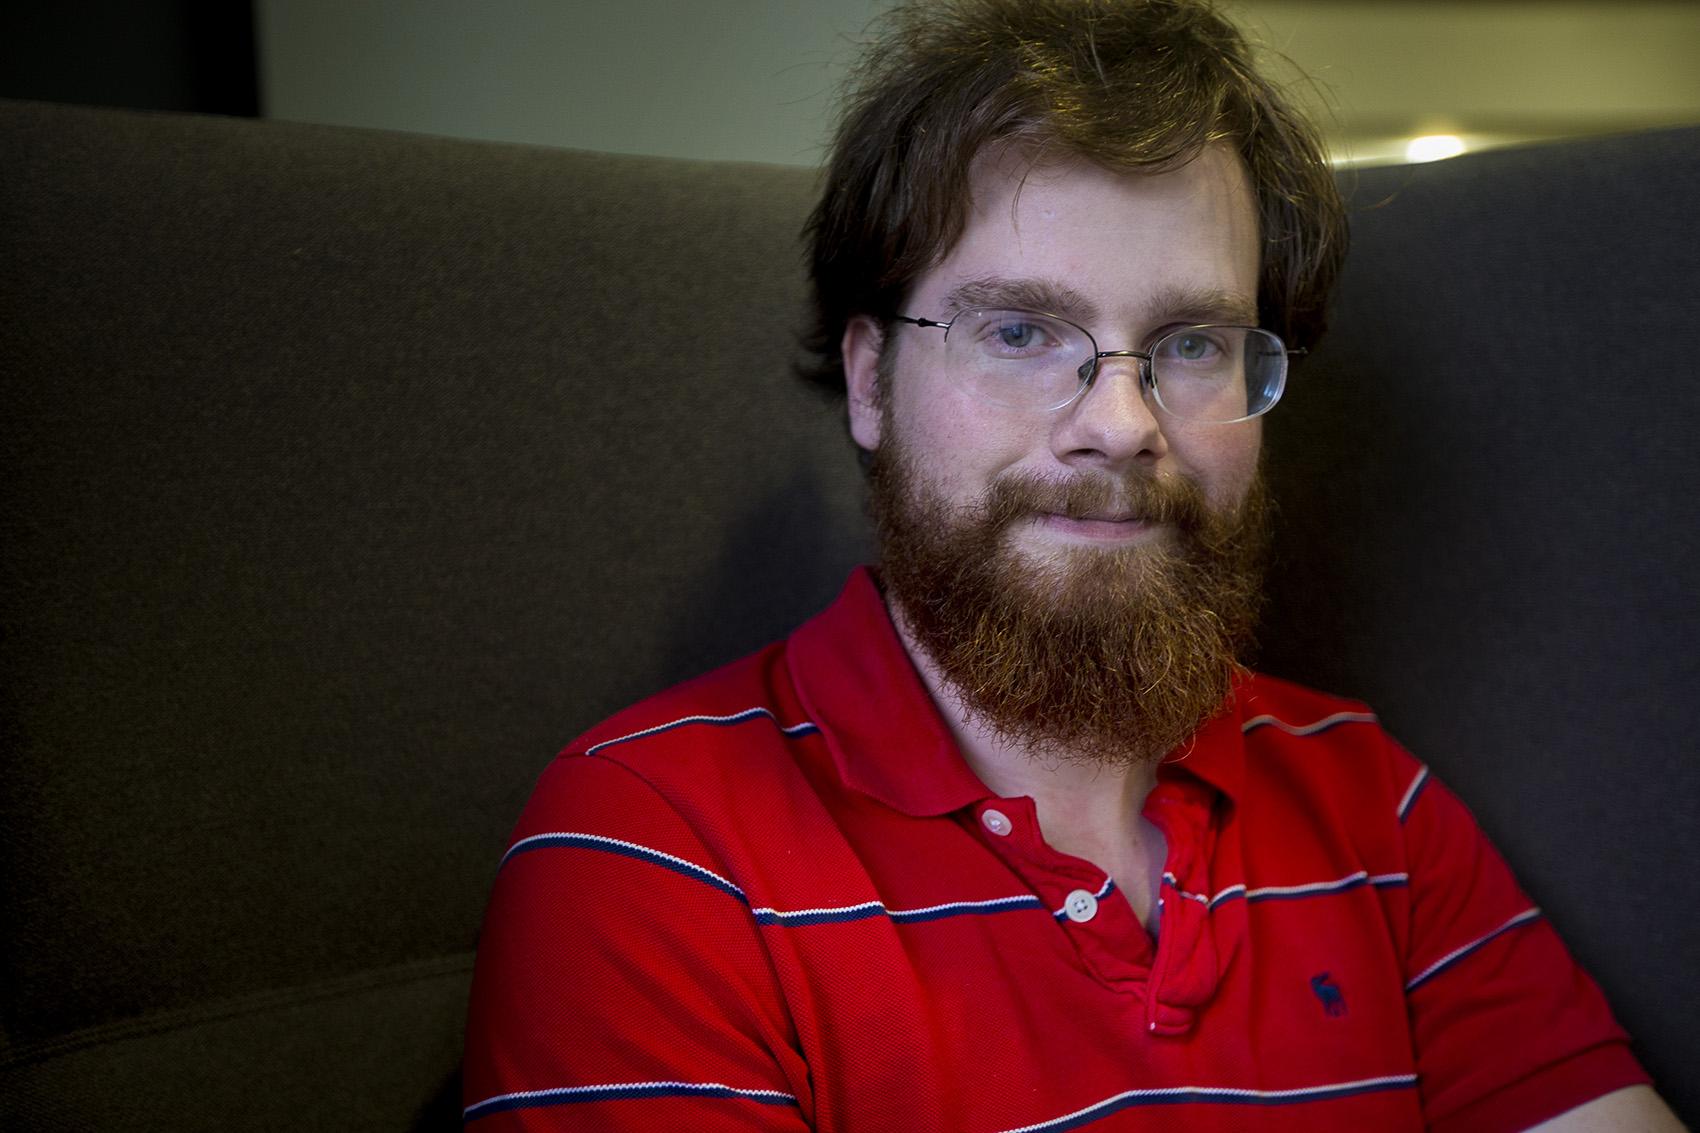 John Medlar, a spokesman for the Boston Free Speech Coalition, at WBUR (Jesse Costa/WBUR)